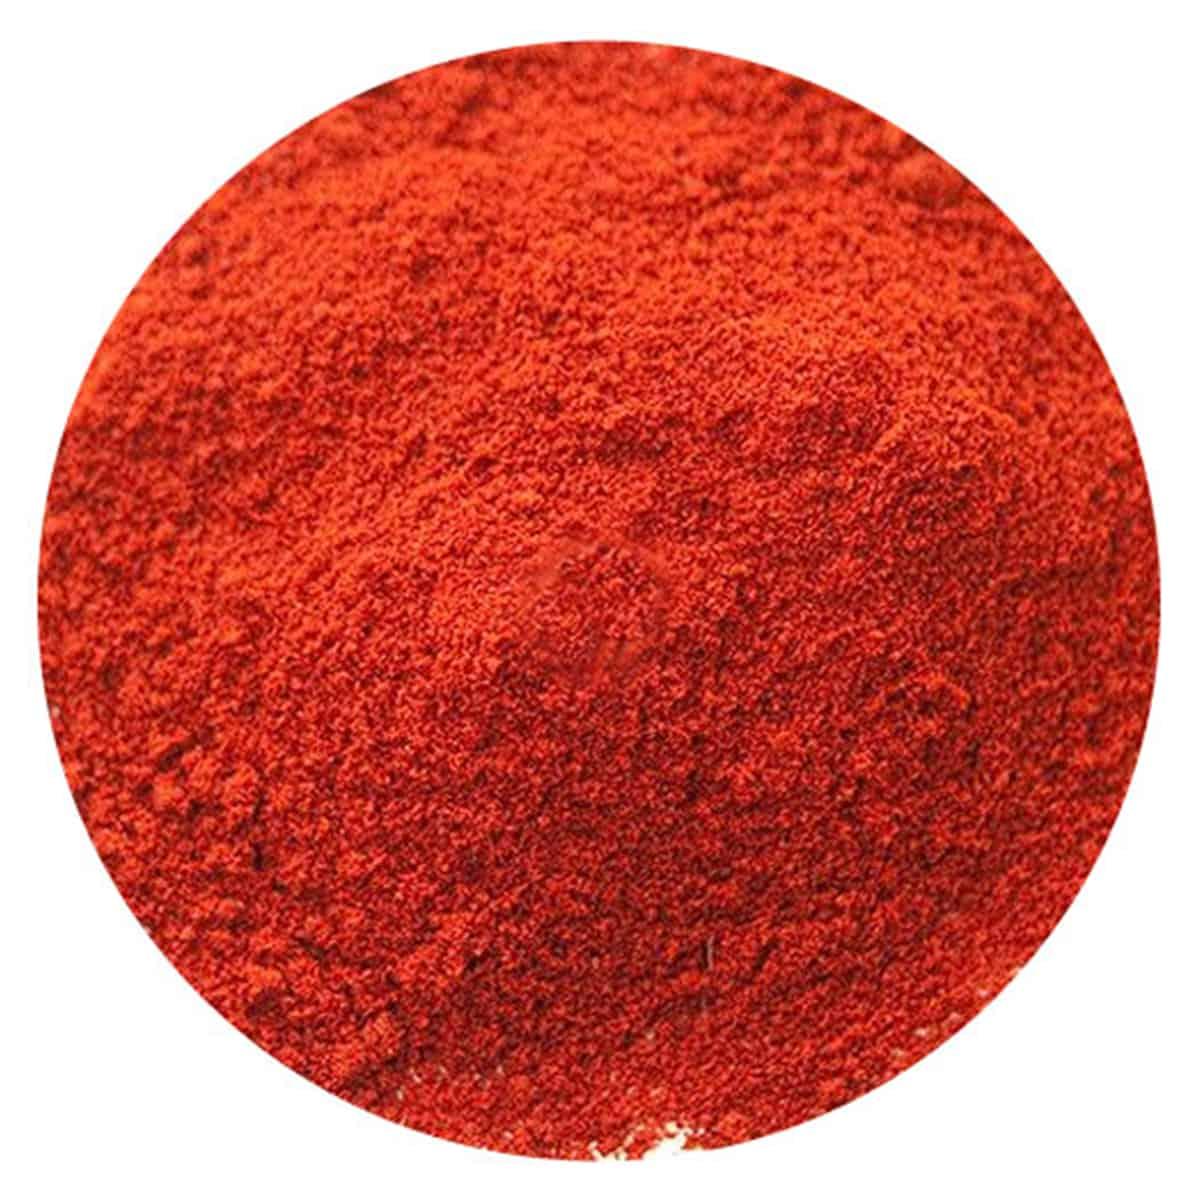 Buy IAG Foods Red Pepper Powder (Chilli Powder) - 1 kg